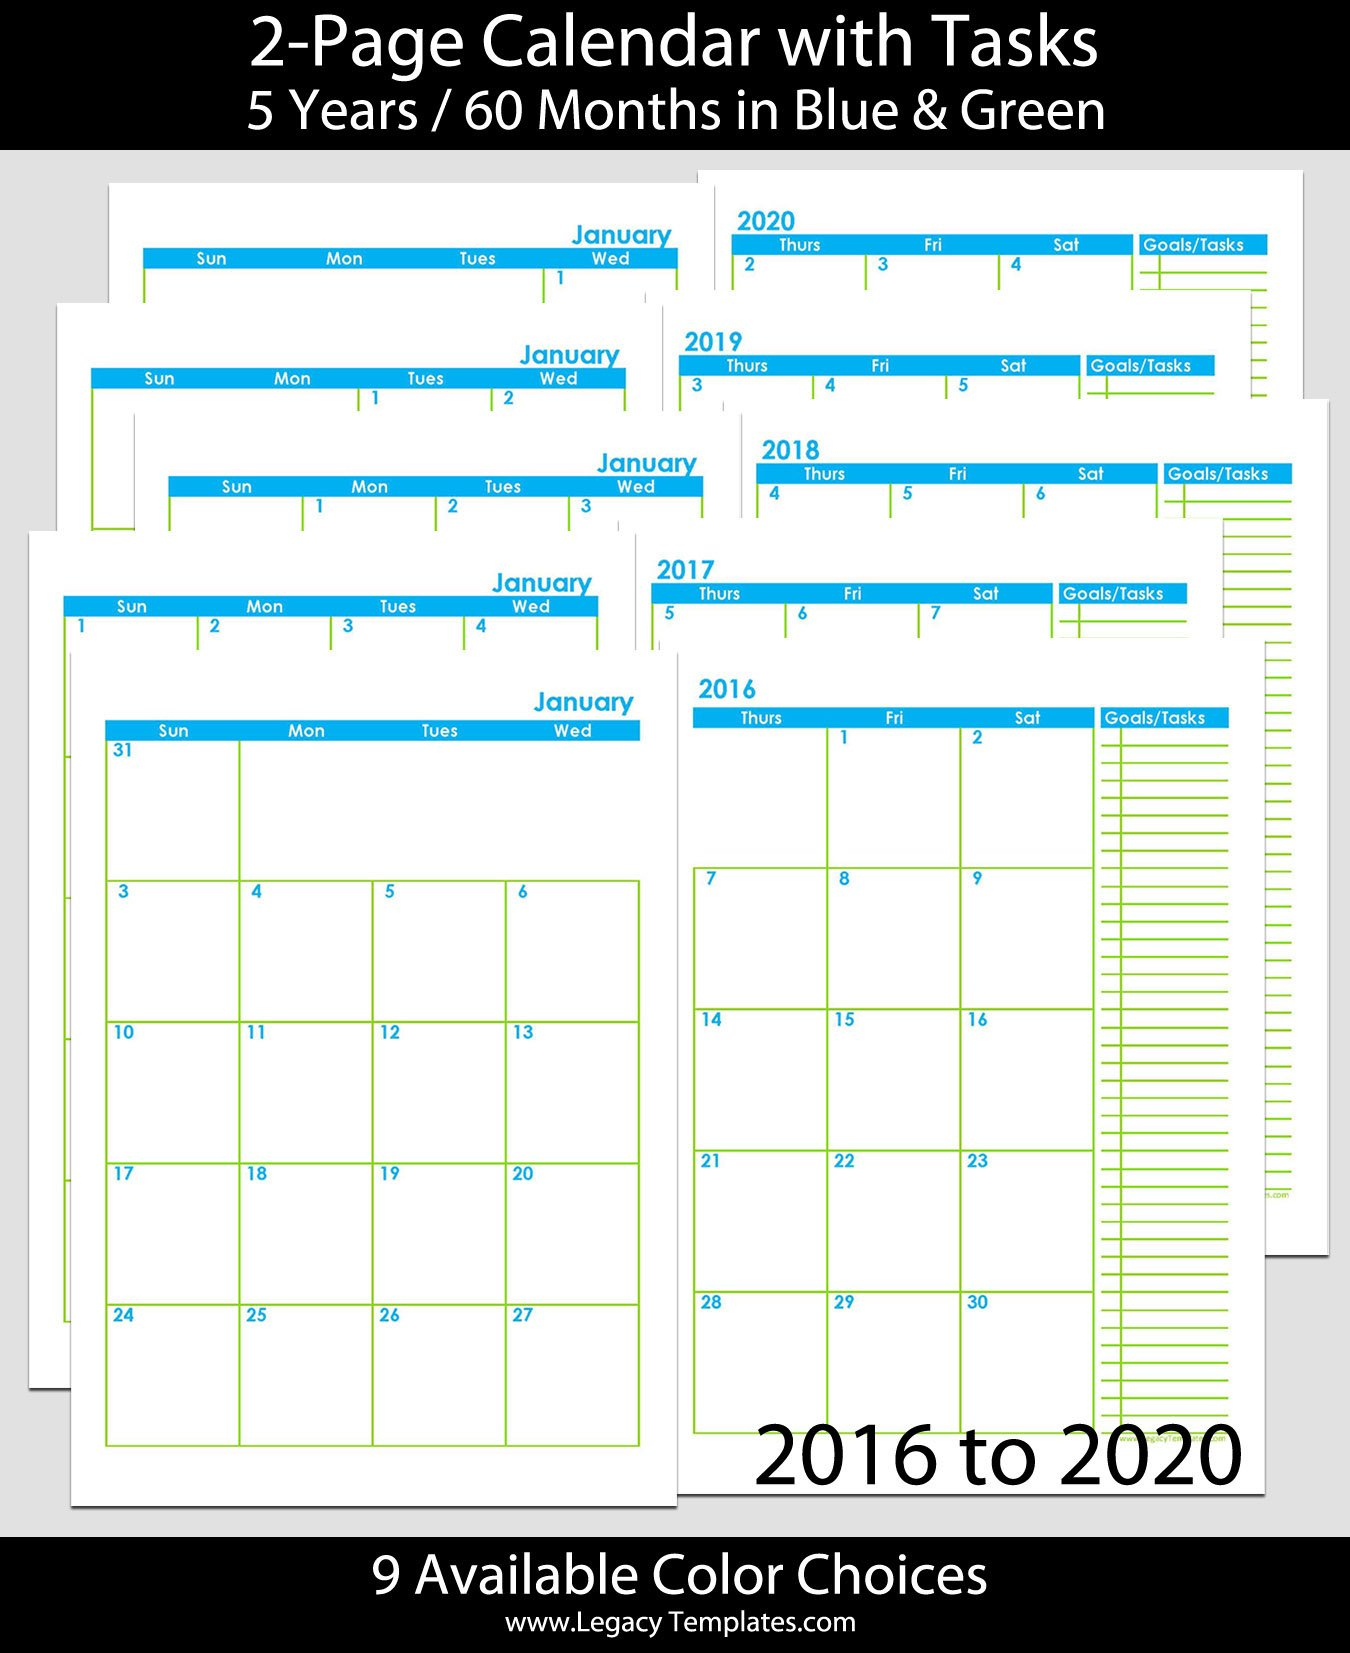 2016 Thru 2020 60 Months 2 Page Calendar – A5 | Legacy Free 8.5 X 5.5 Printable Calendar